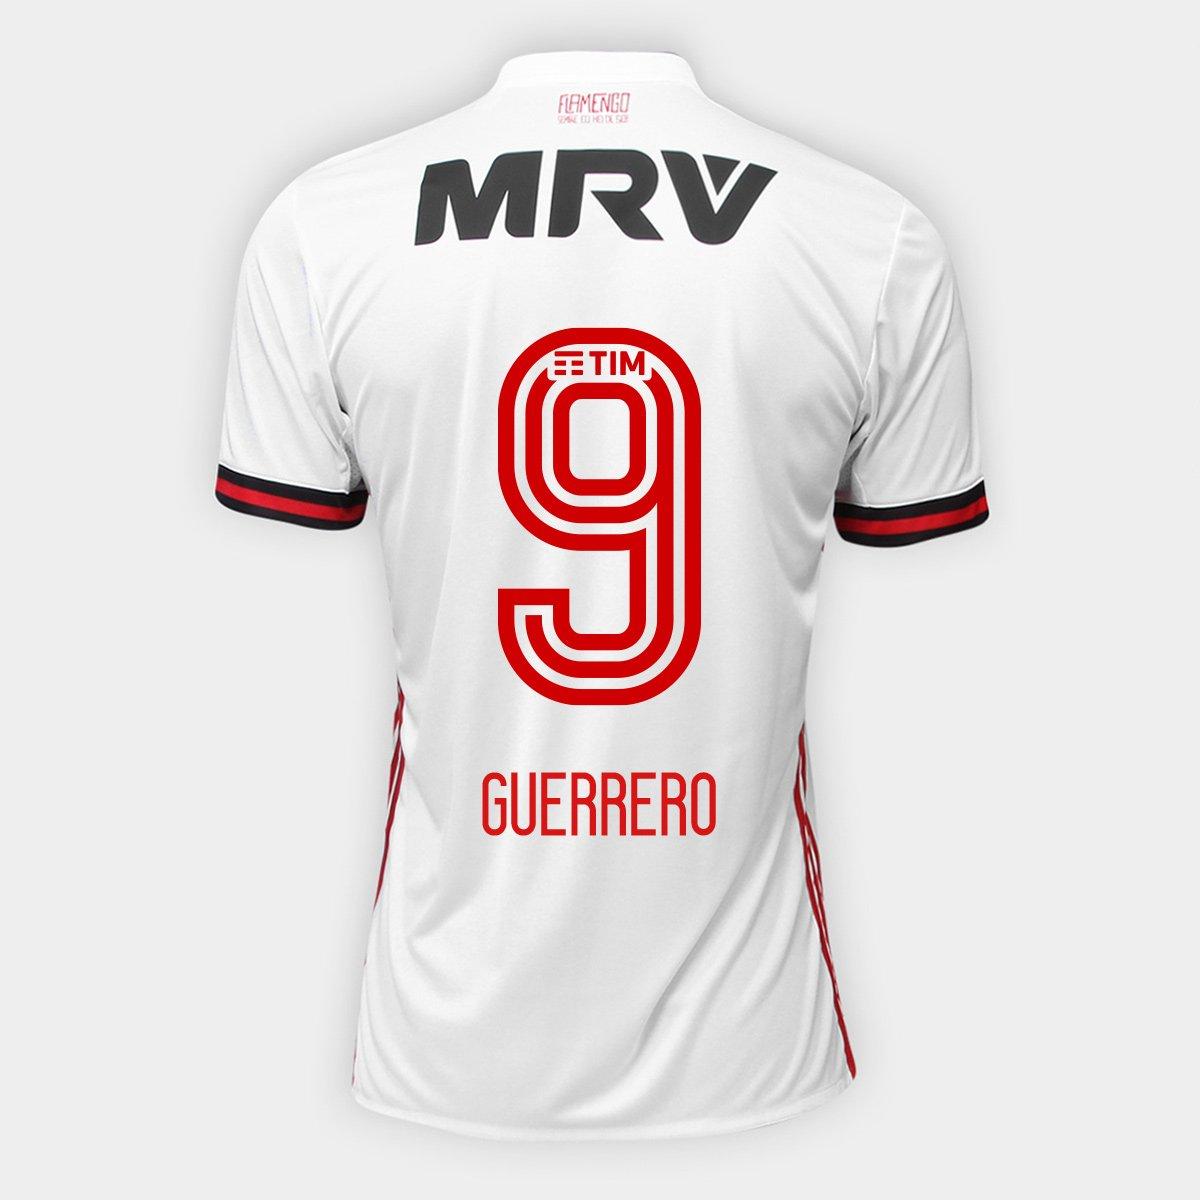 a6aa362538 Camisa Adidas Flamengo II 17 18 N° 9 - Guerrero - Compre Agora ...